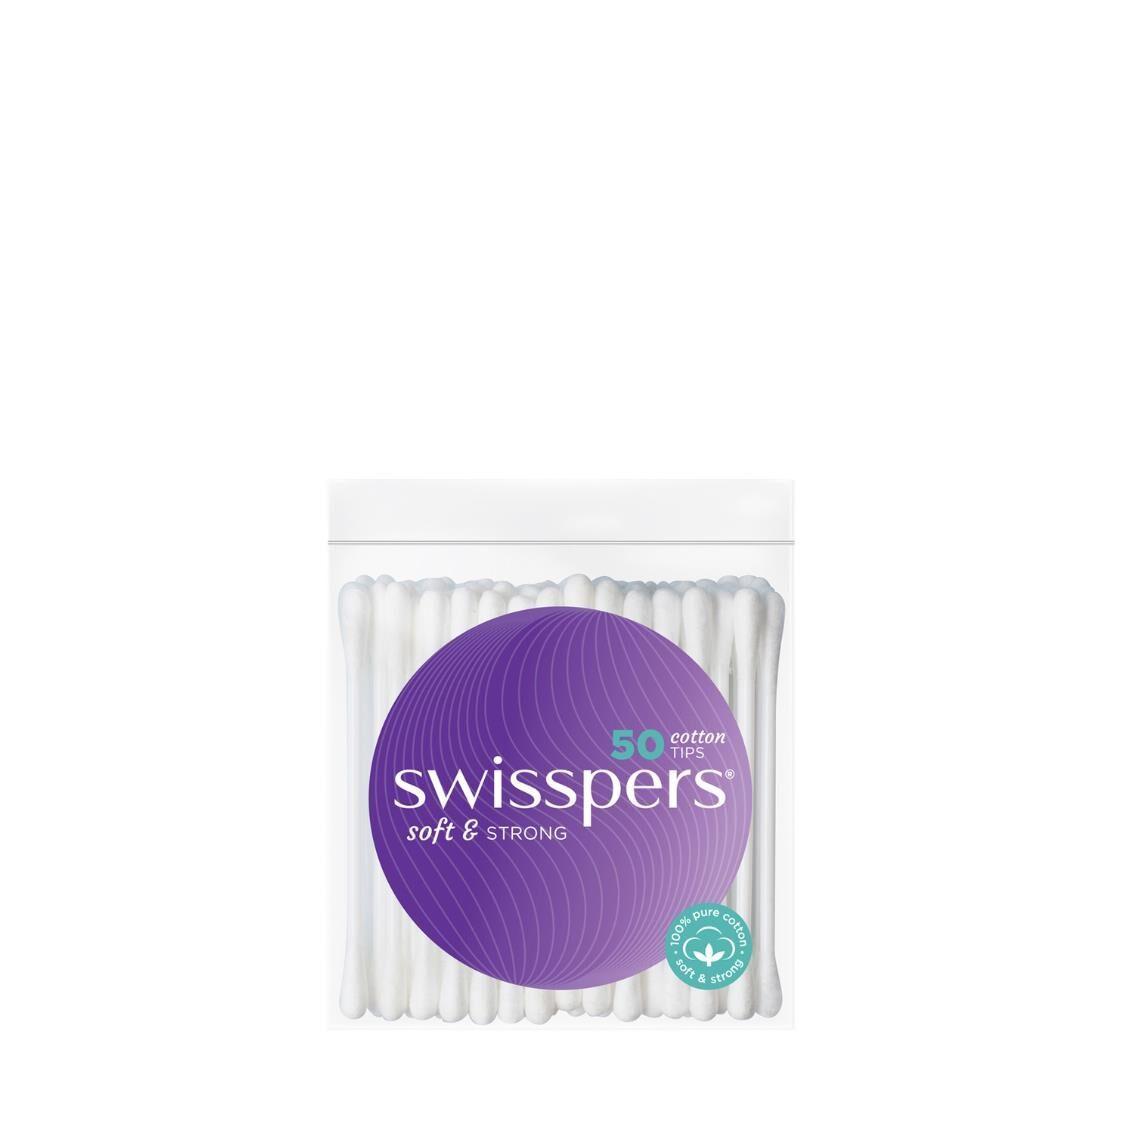 Swisspers Cotton Tips 50 Pack